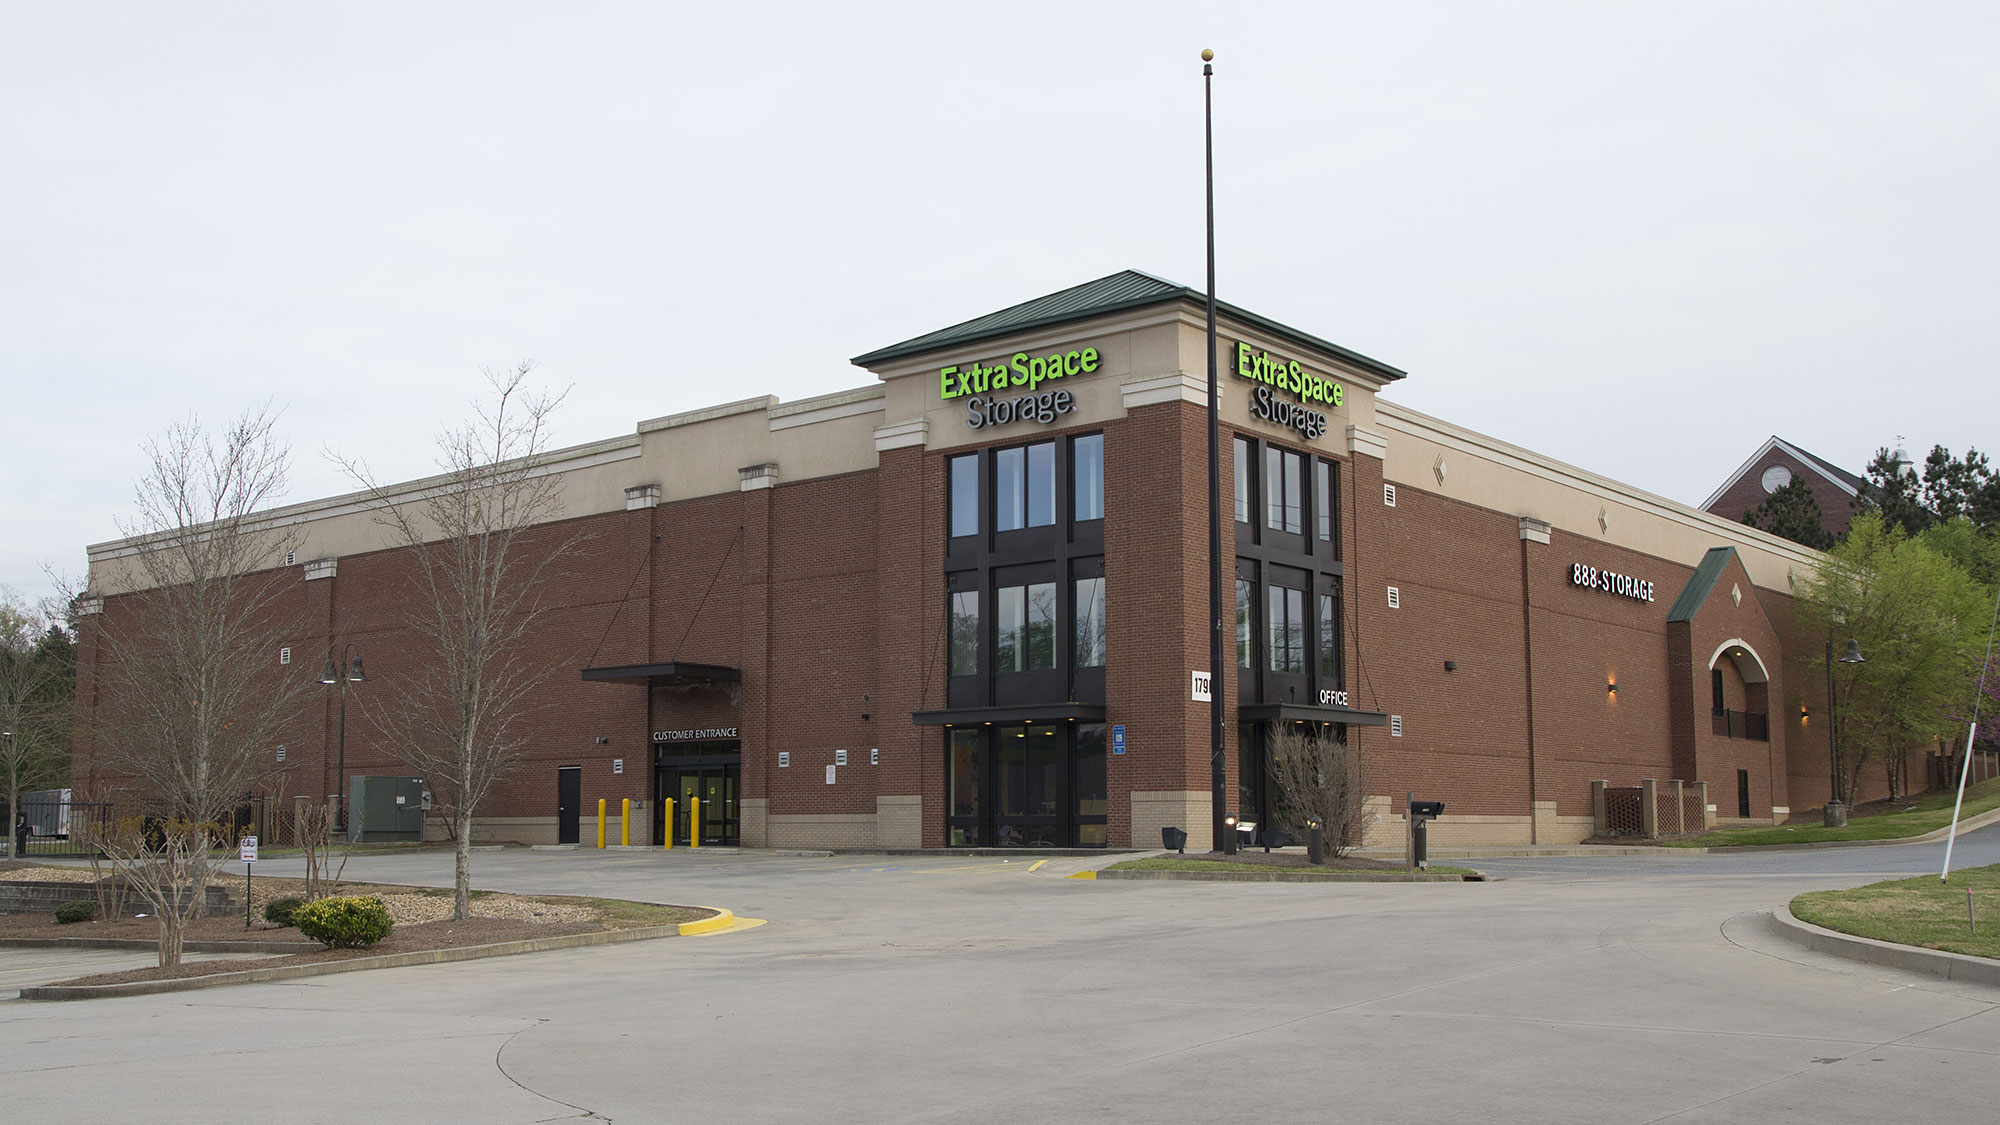 1790 Peachtree Industrial Blvd. Duluth, GA 30097. Self Storage Facility